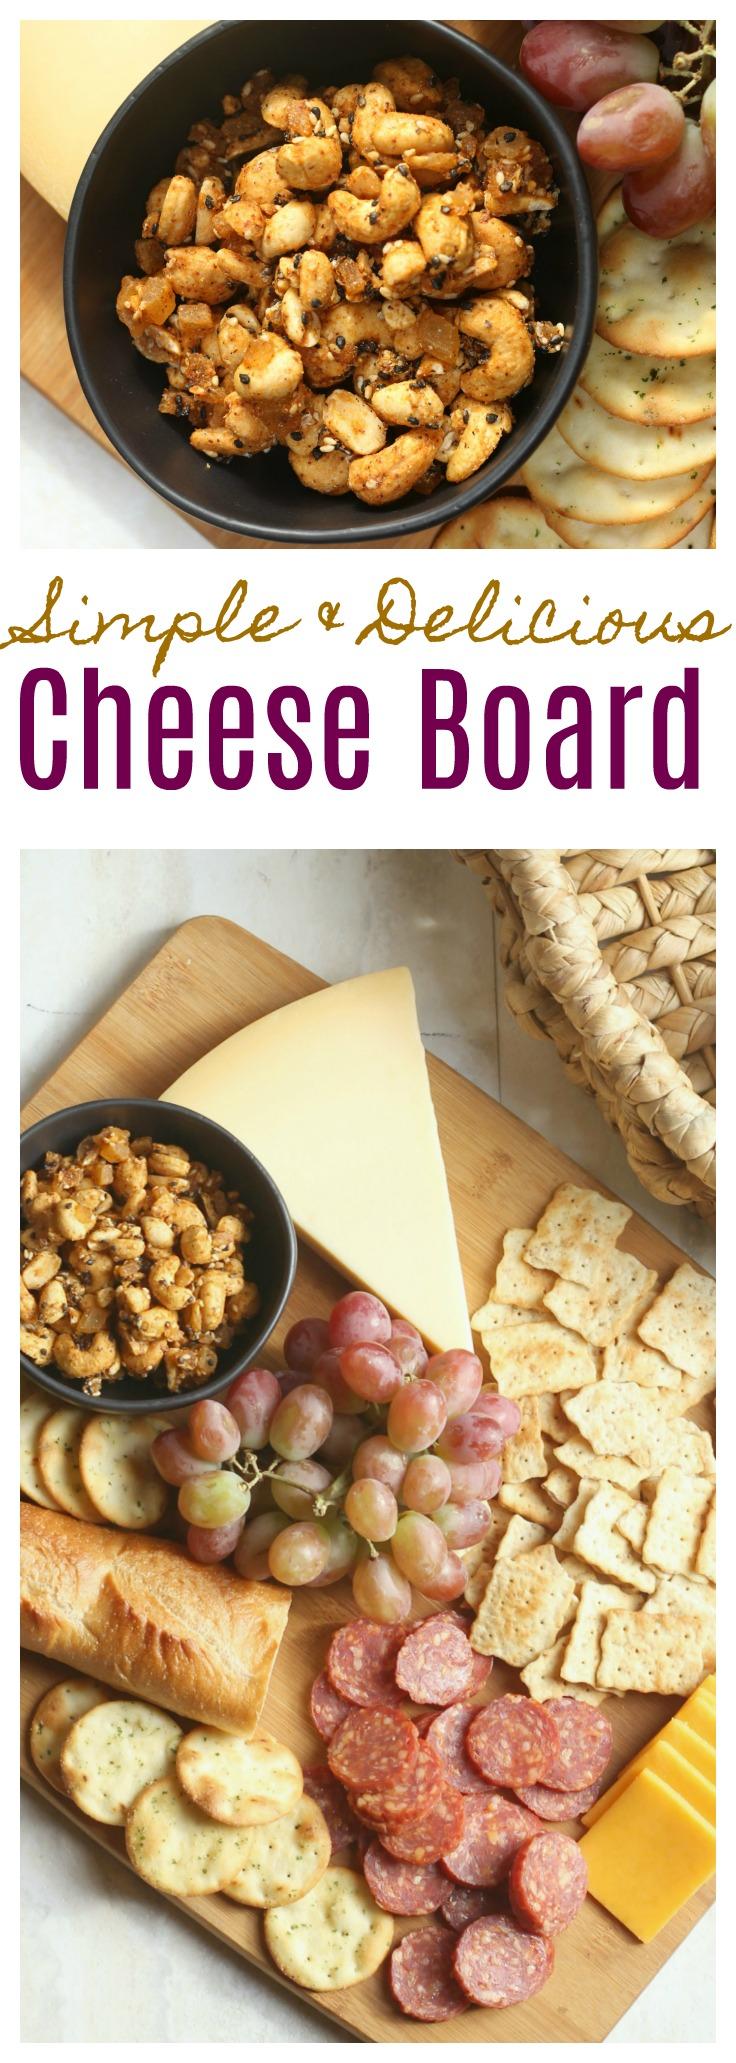 Simple Fall Cheese Board